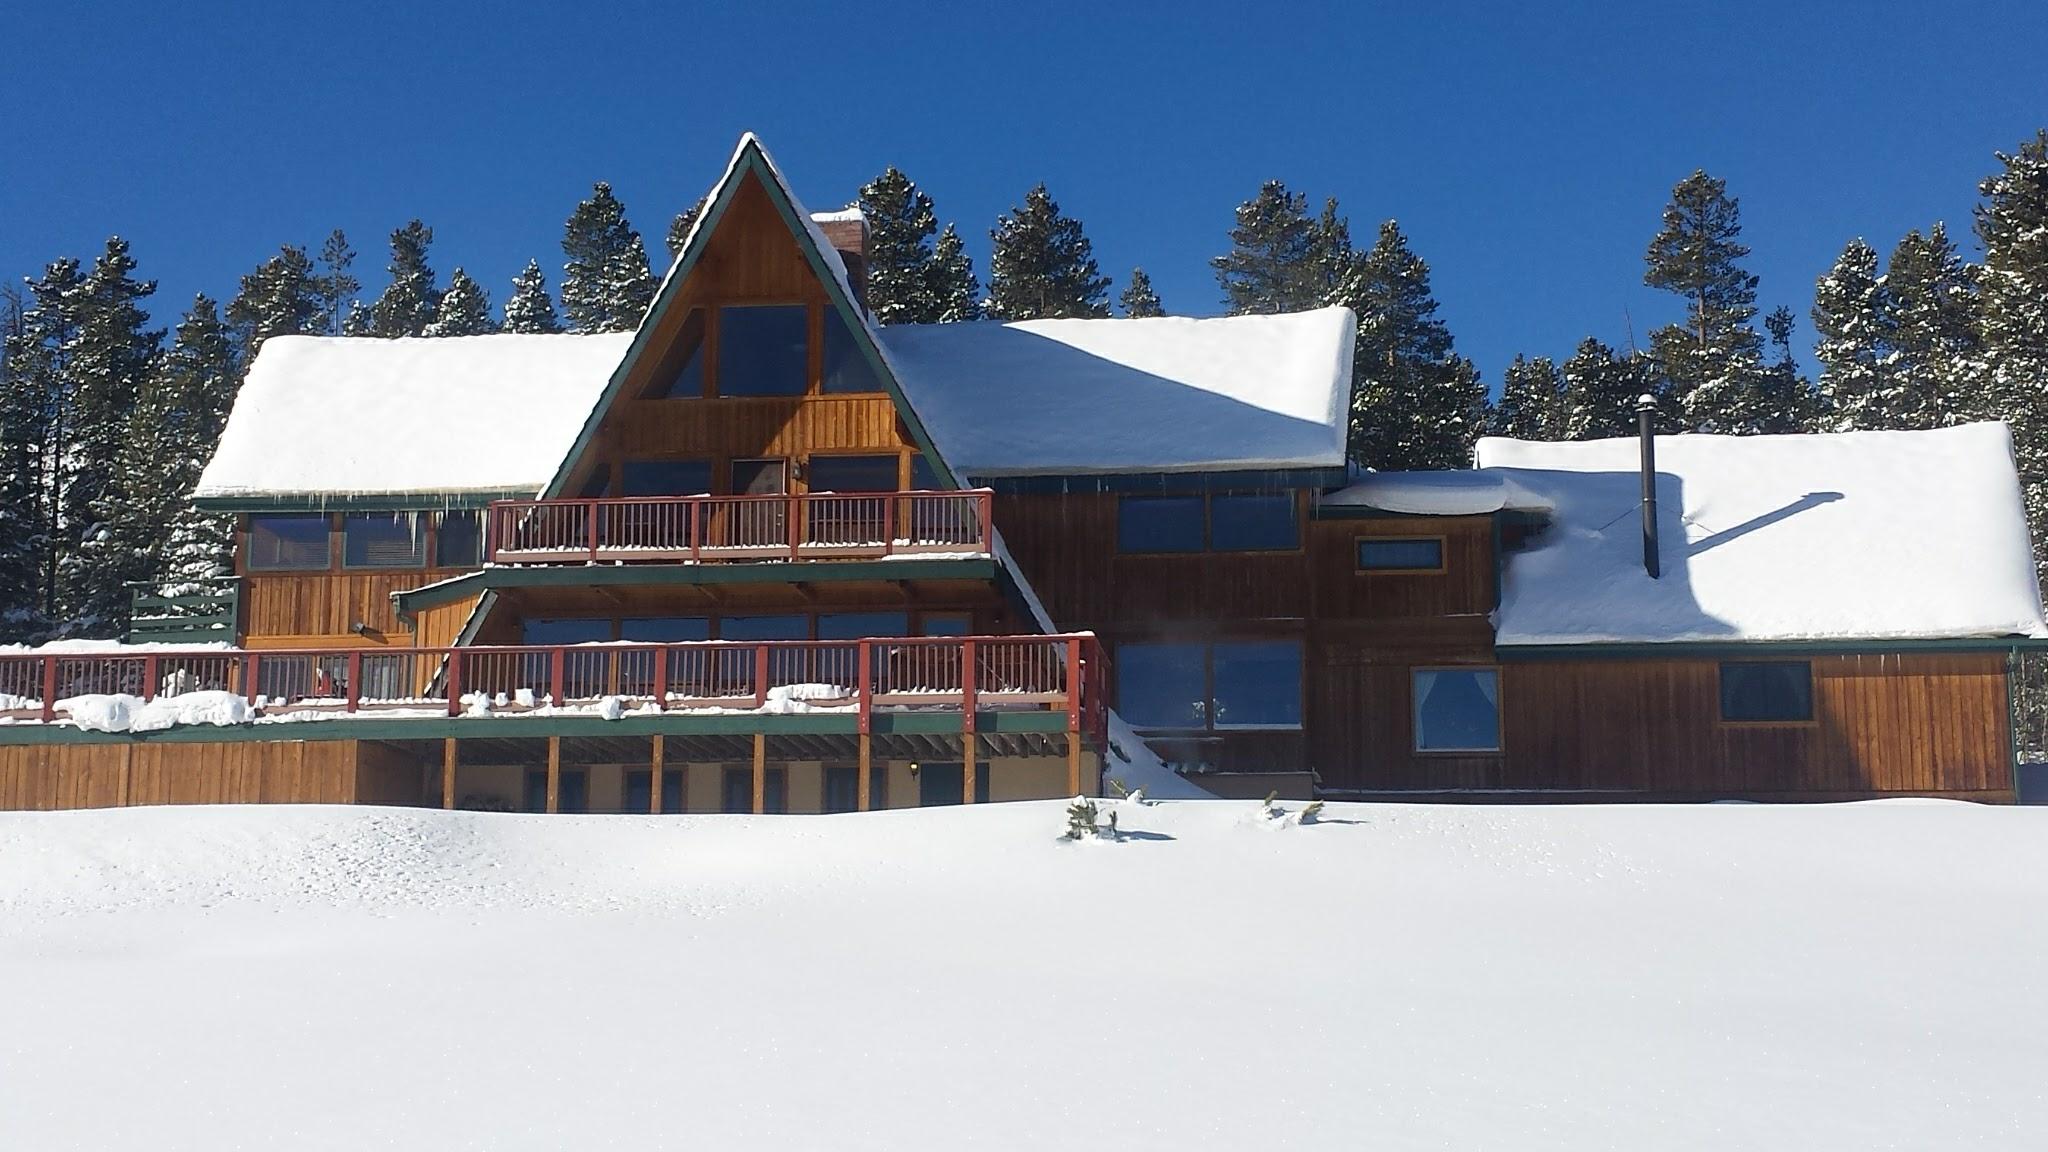 Winter exterior view of large rental house on Peak 7 in Breckenridge